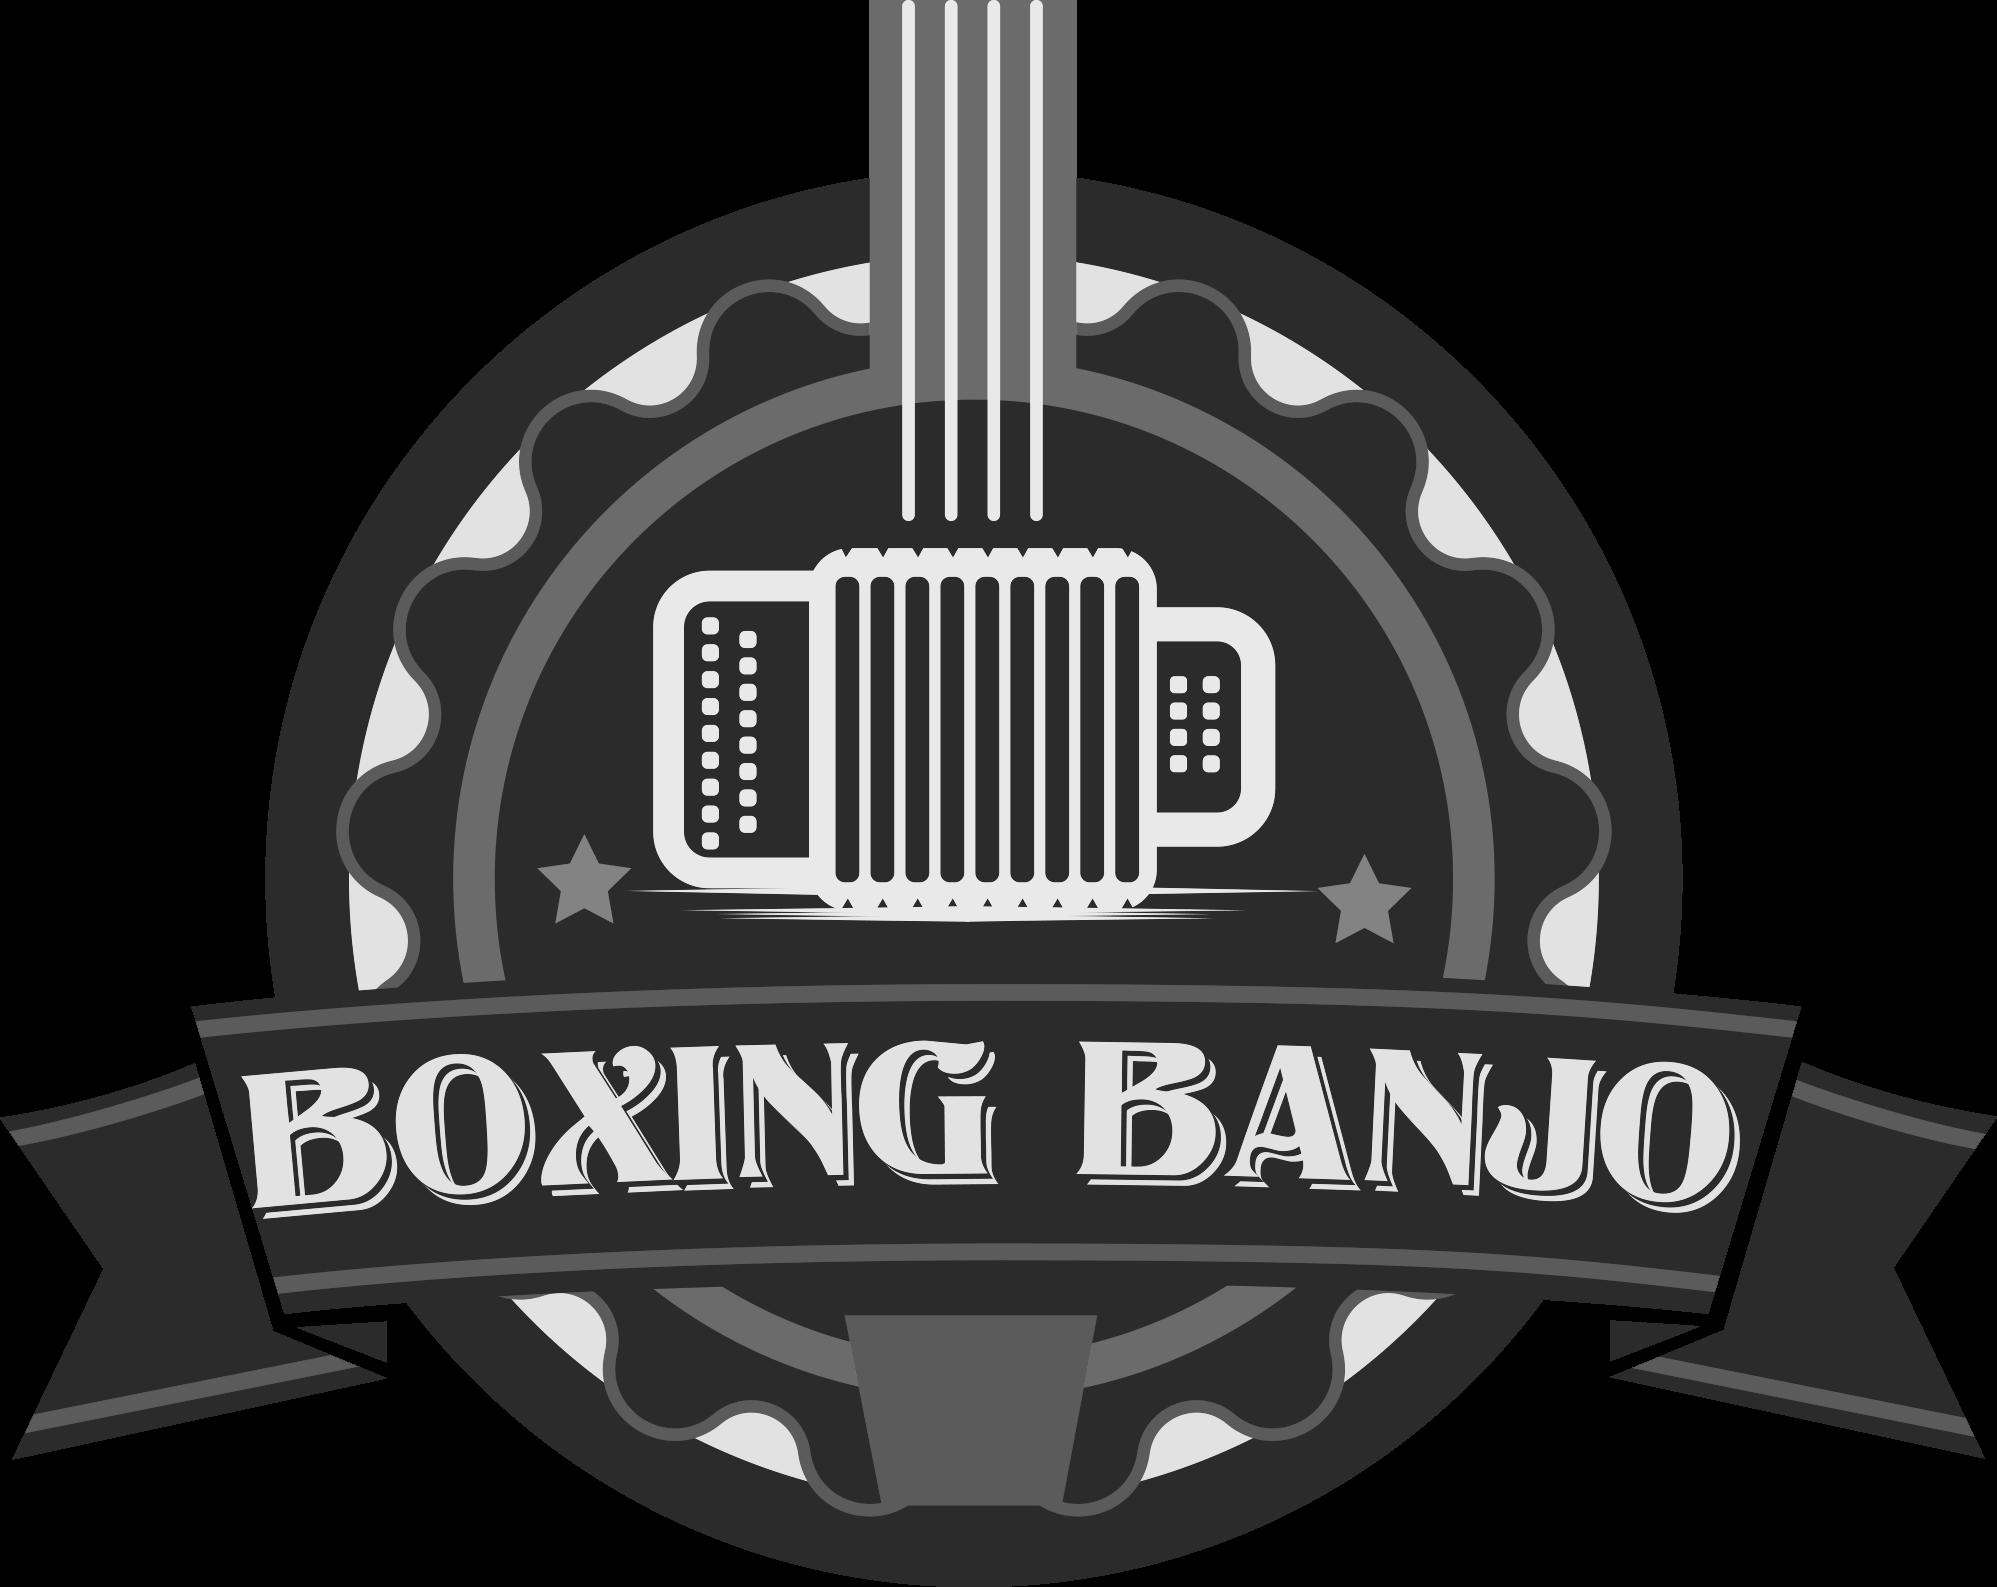 BOXING BANJO